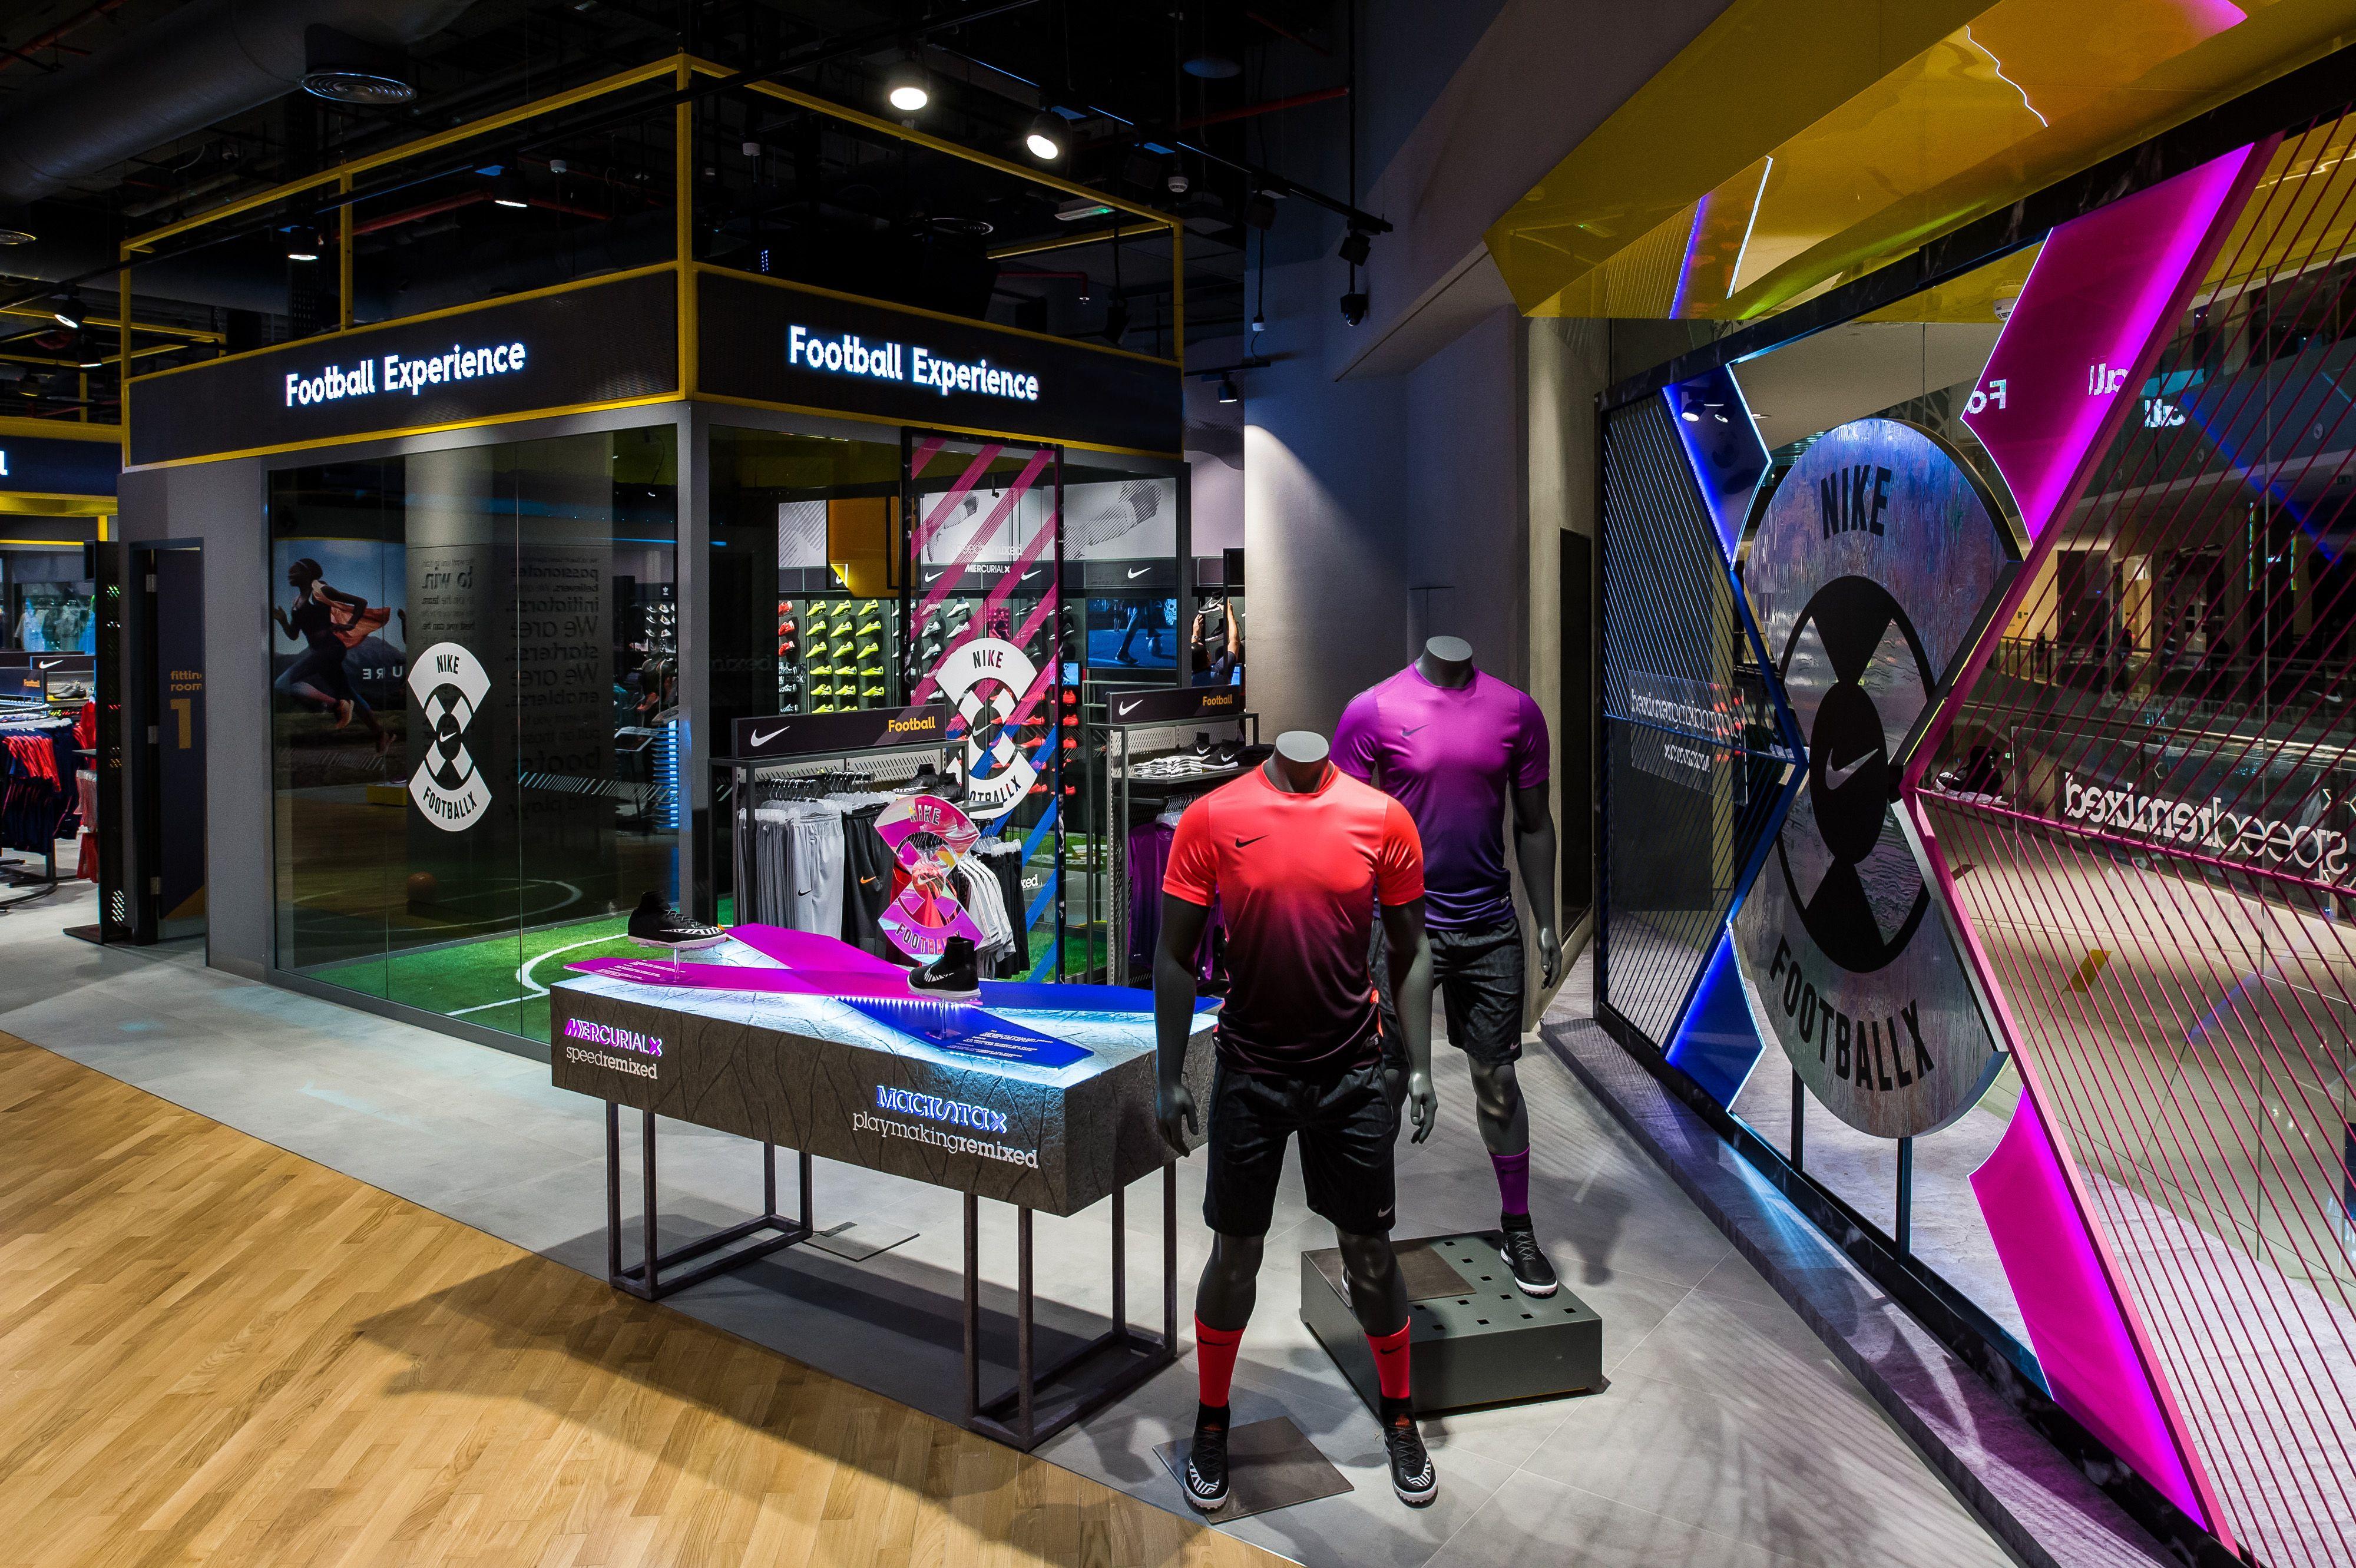 Sun & Sand Sports Store The Dubai Mall Football